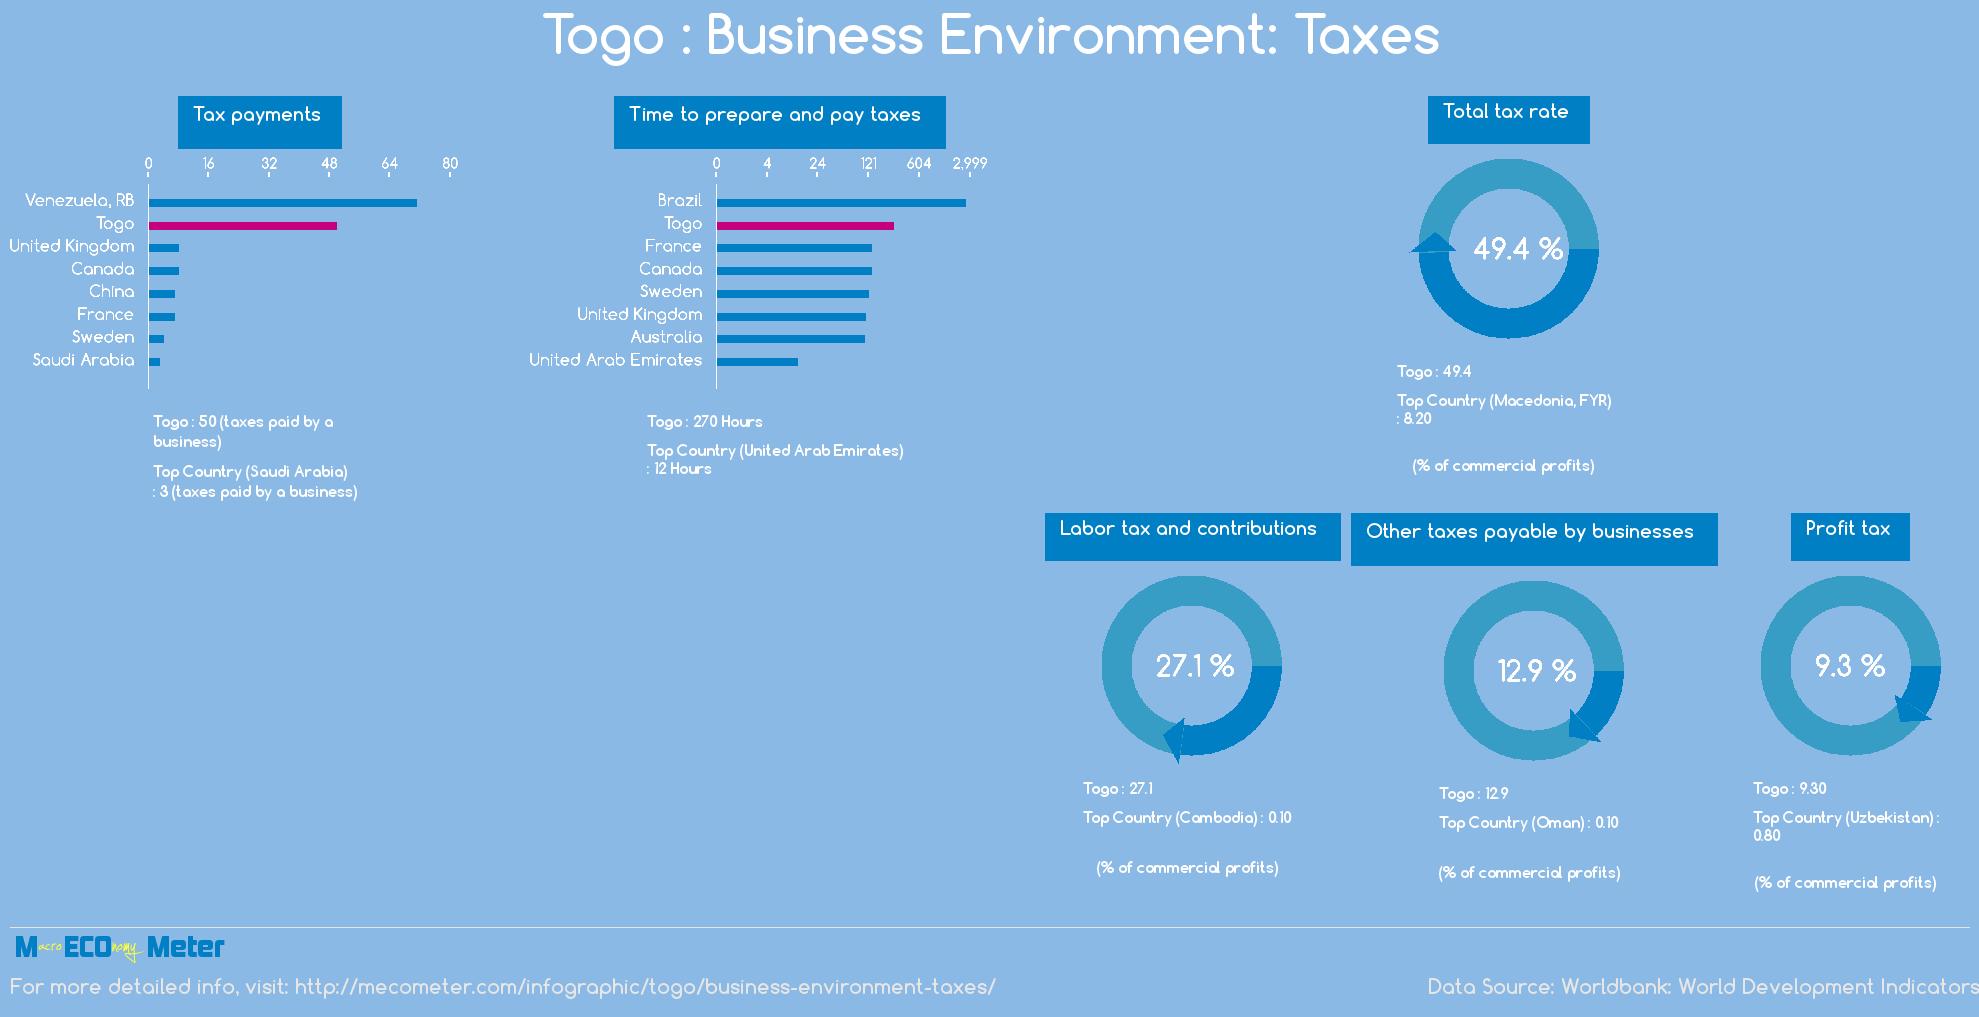 Togo : Business Environment: Taxes